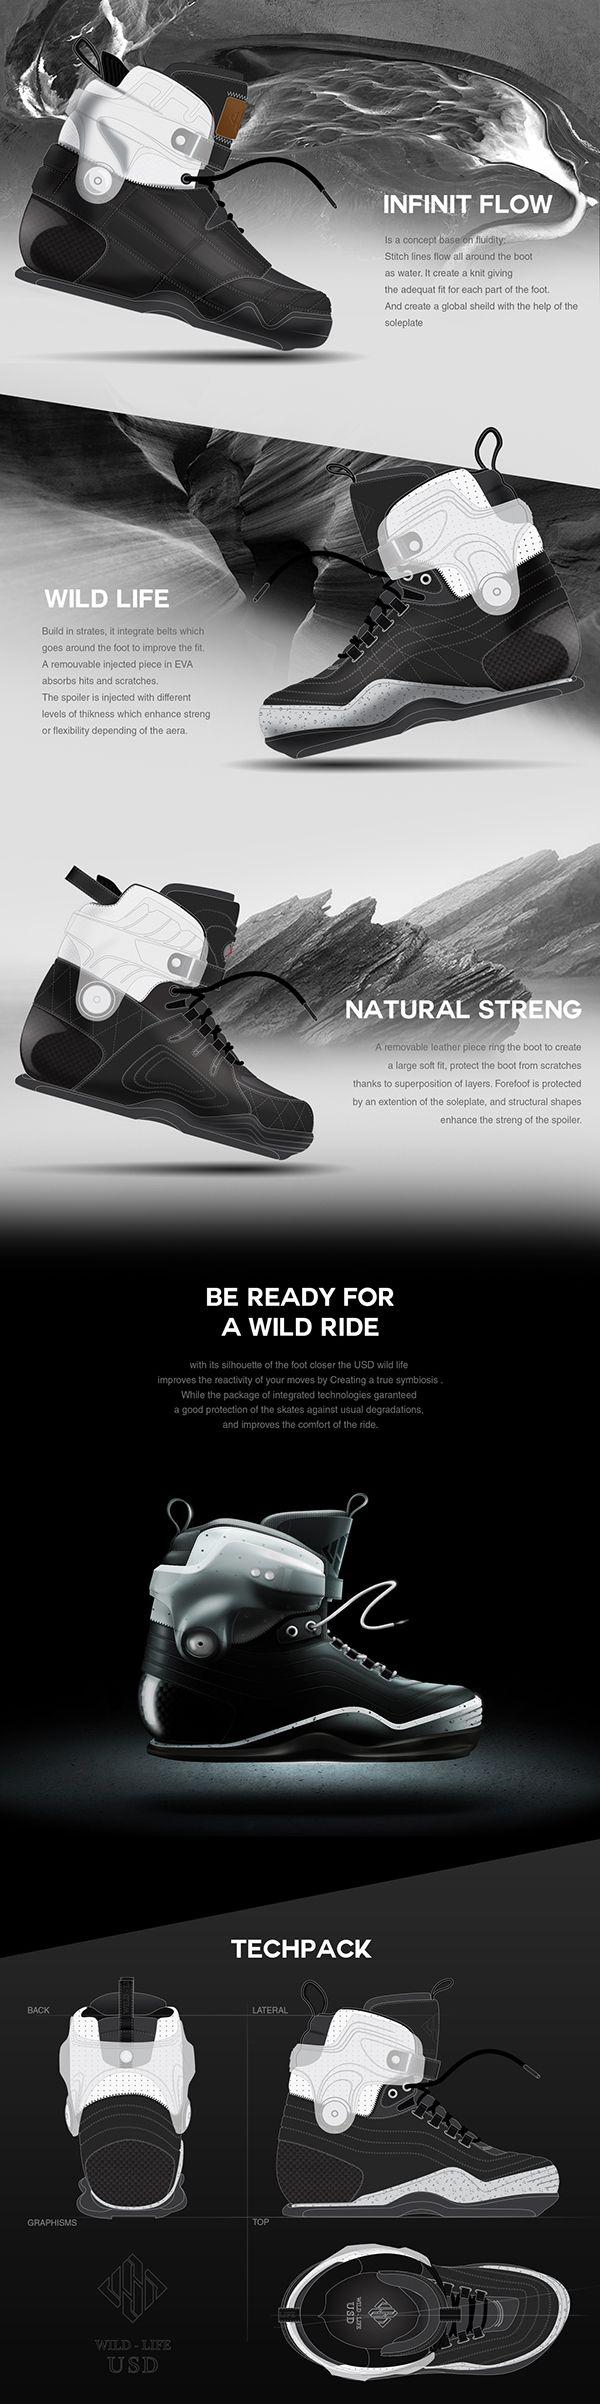 USD Wild Life skates concept on Behance